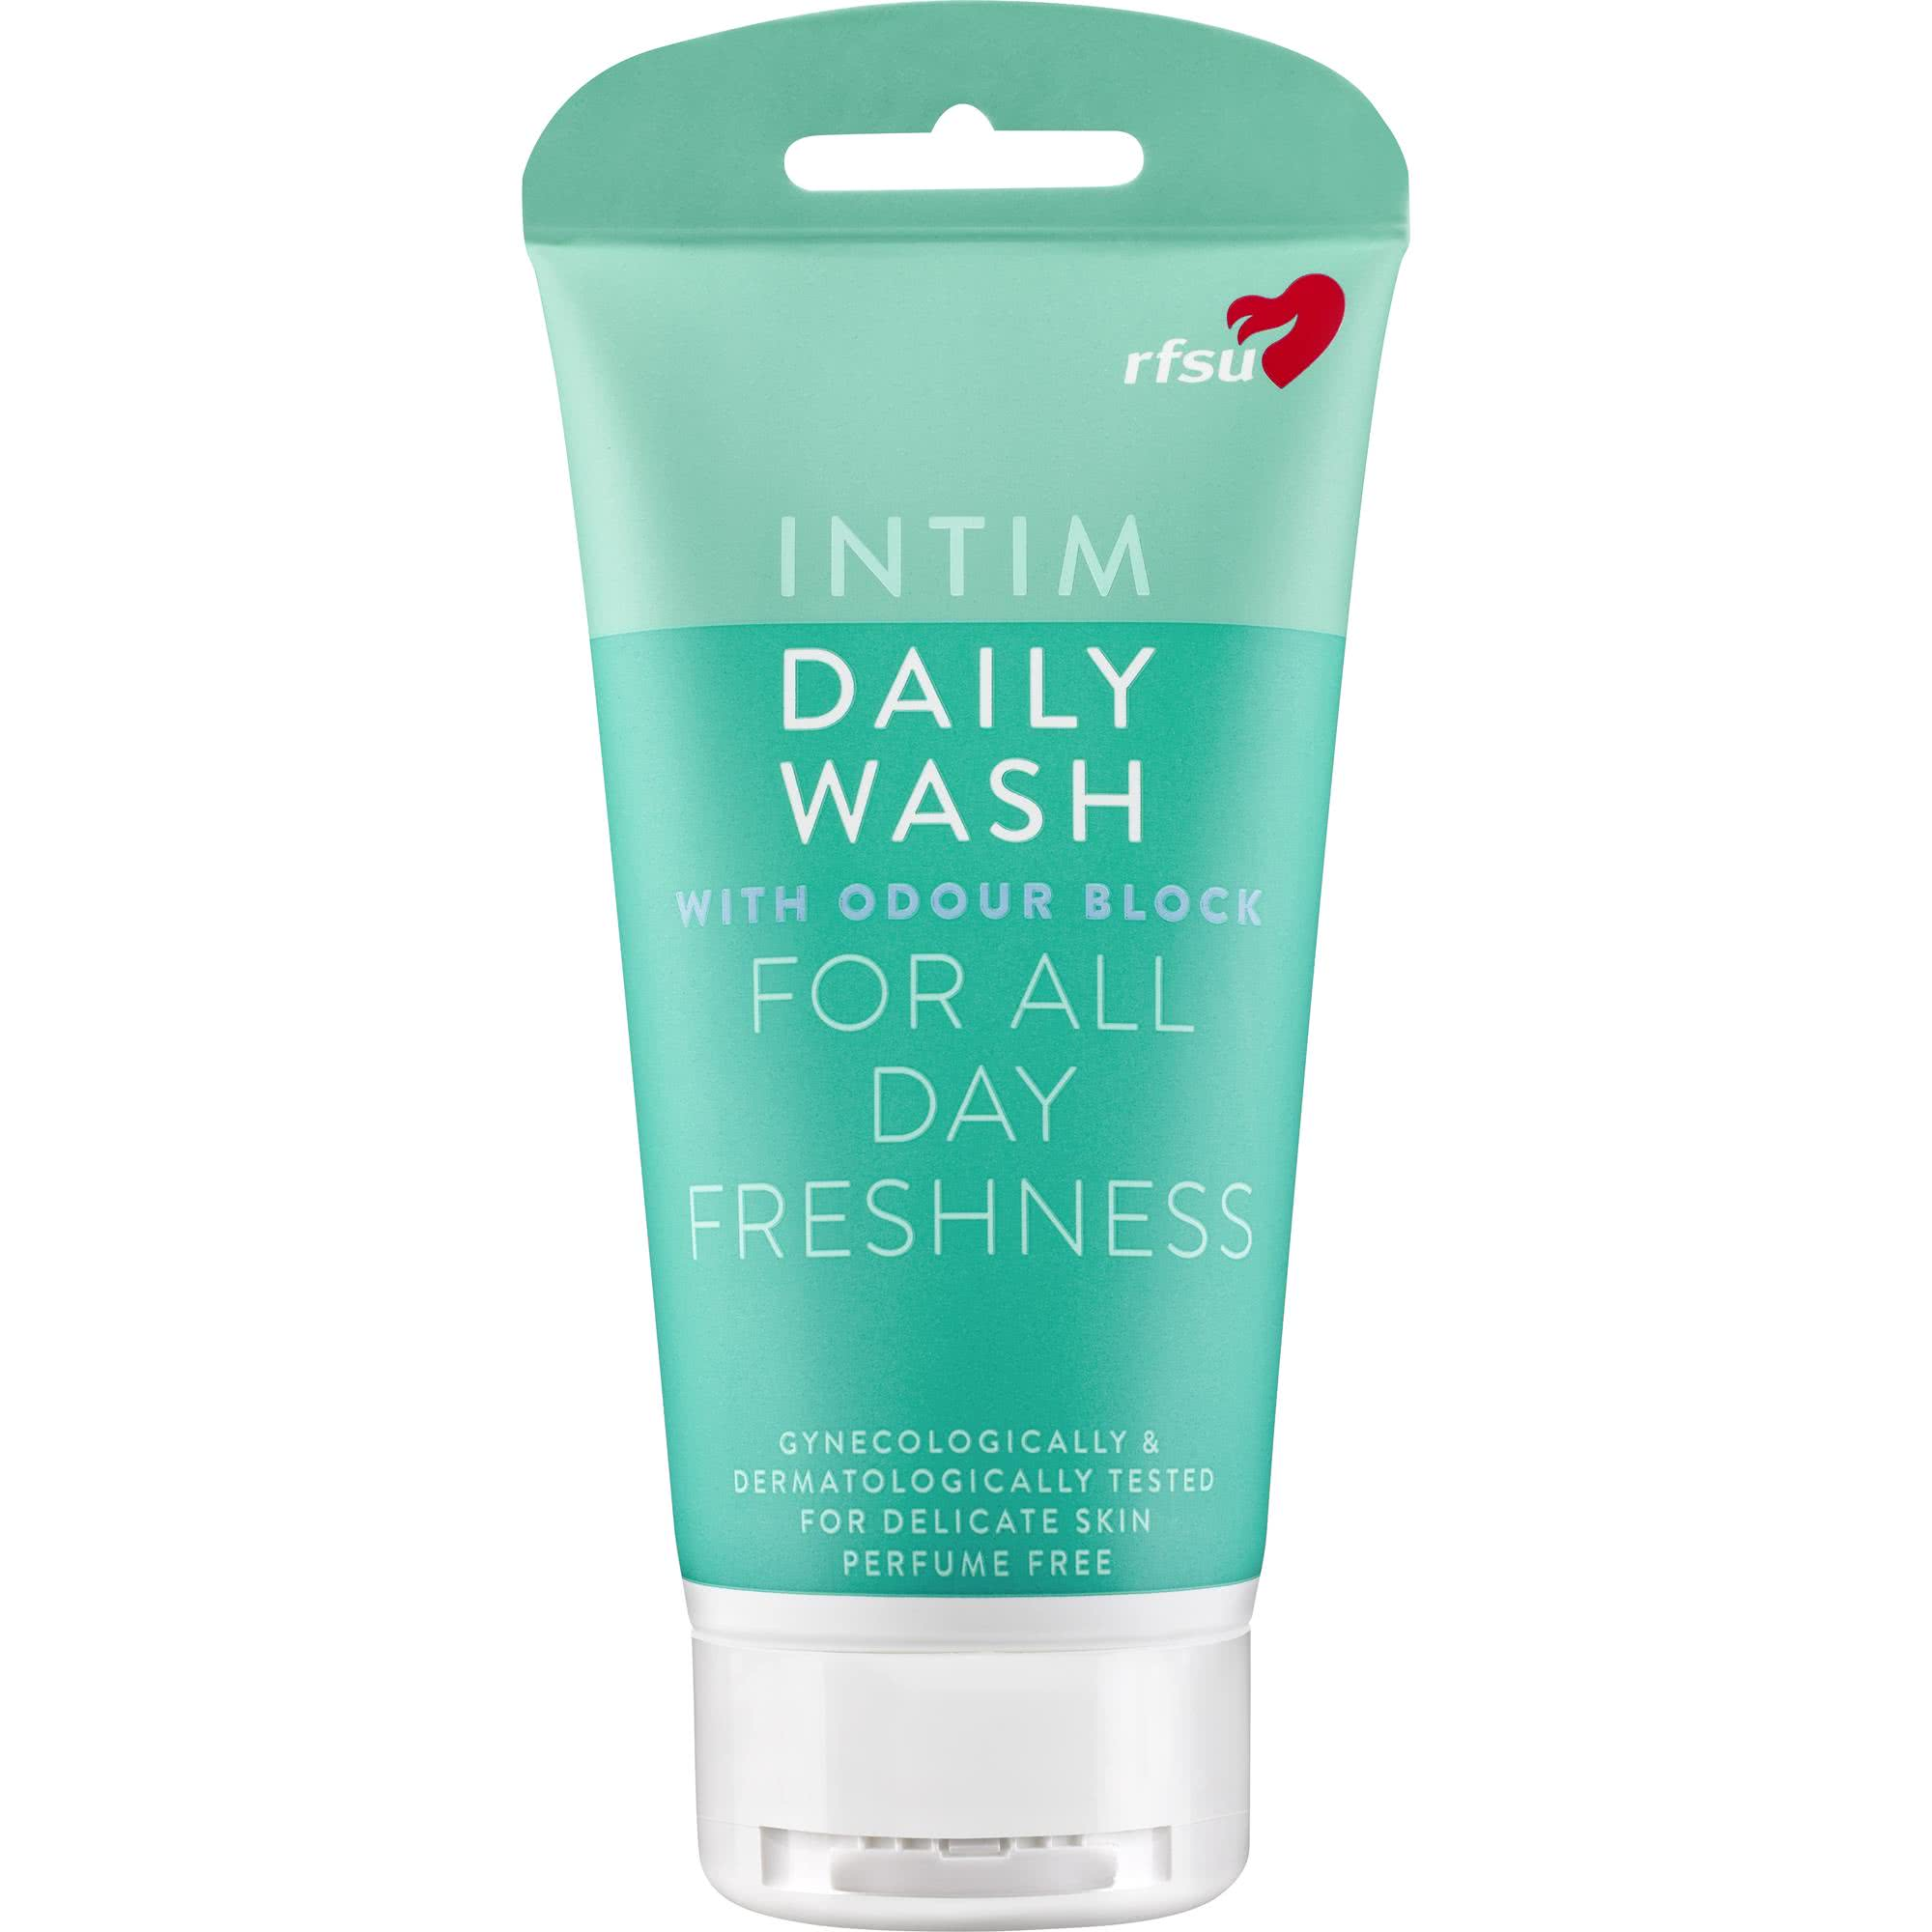 RFSU Intim Daily Wash - 150ml